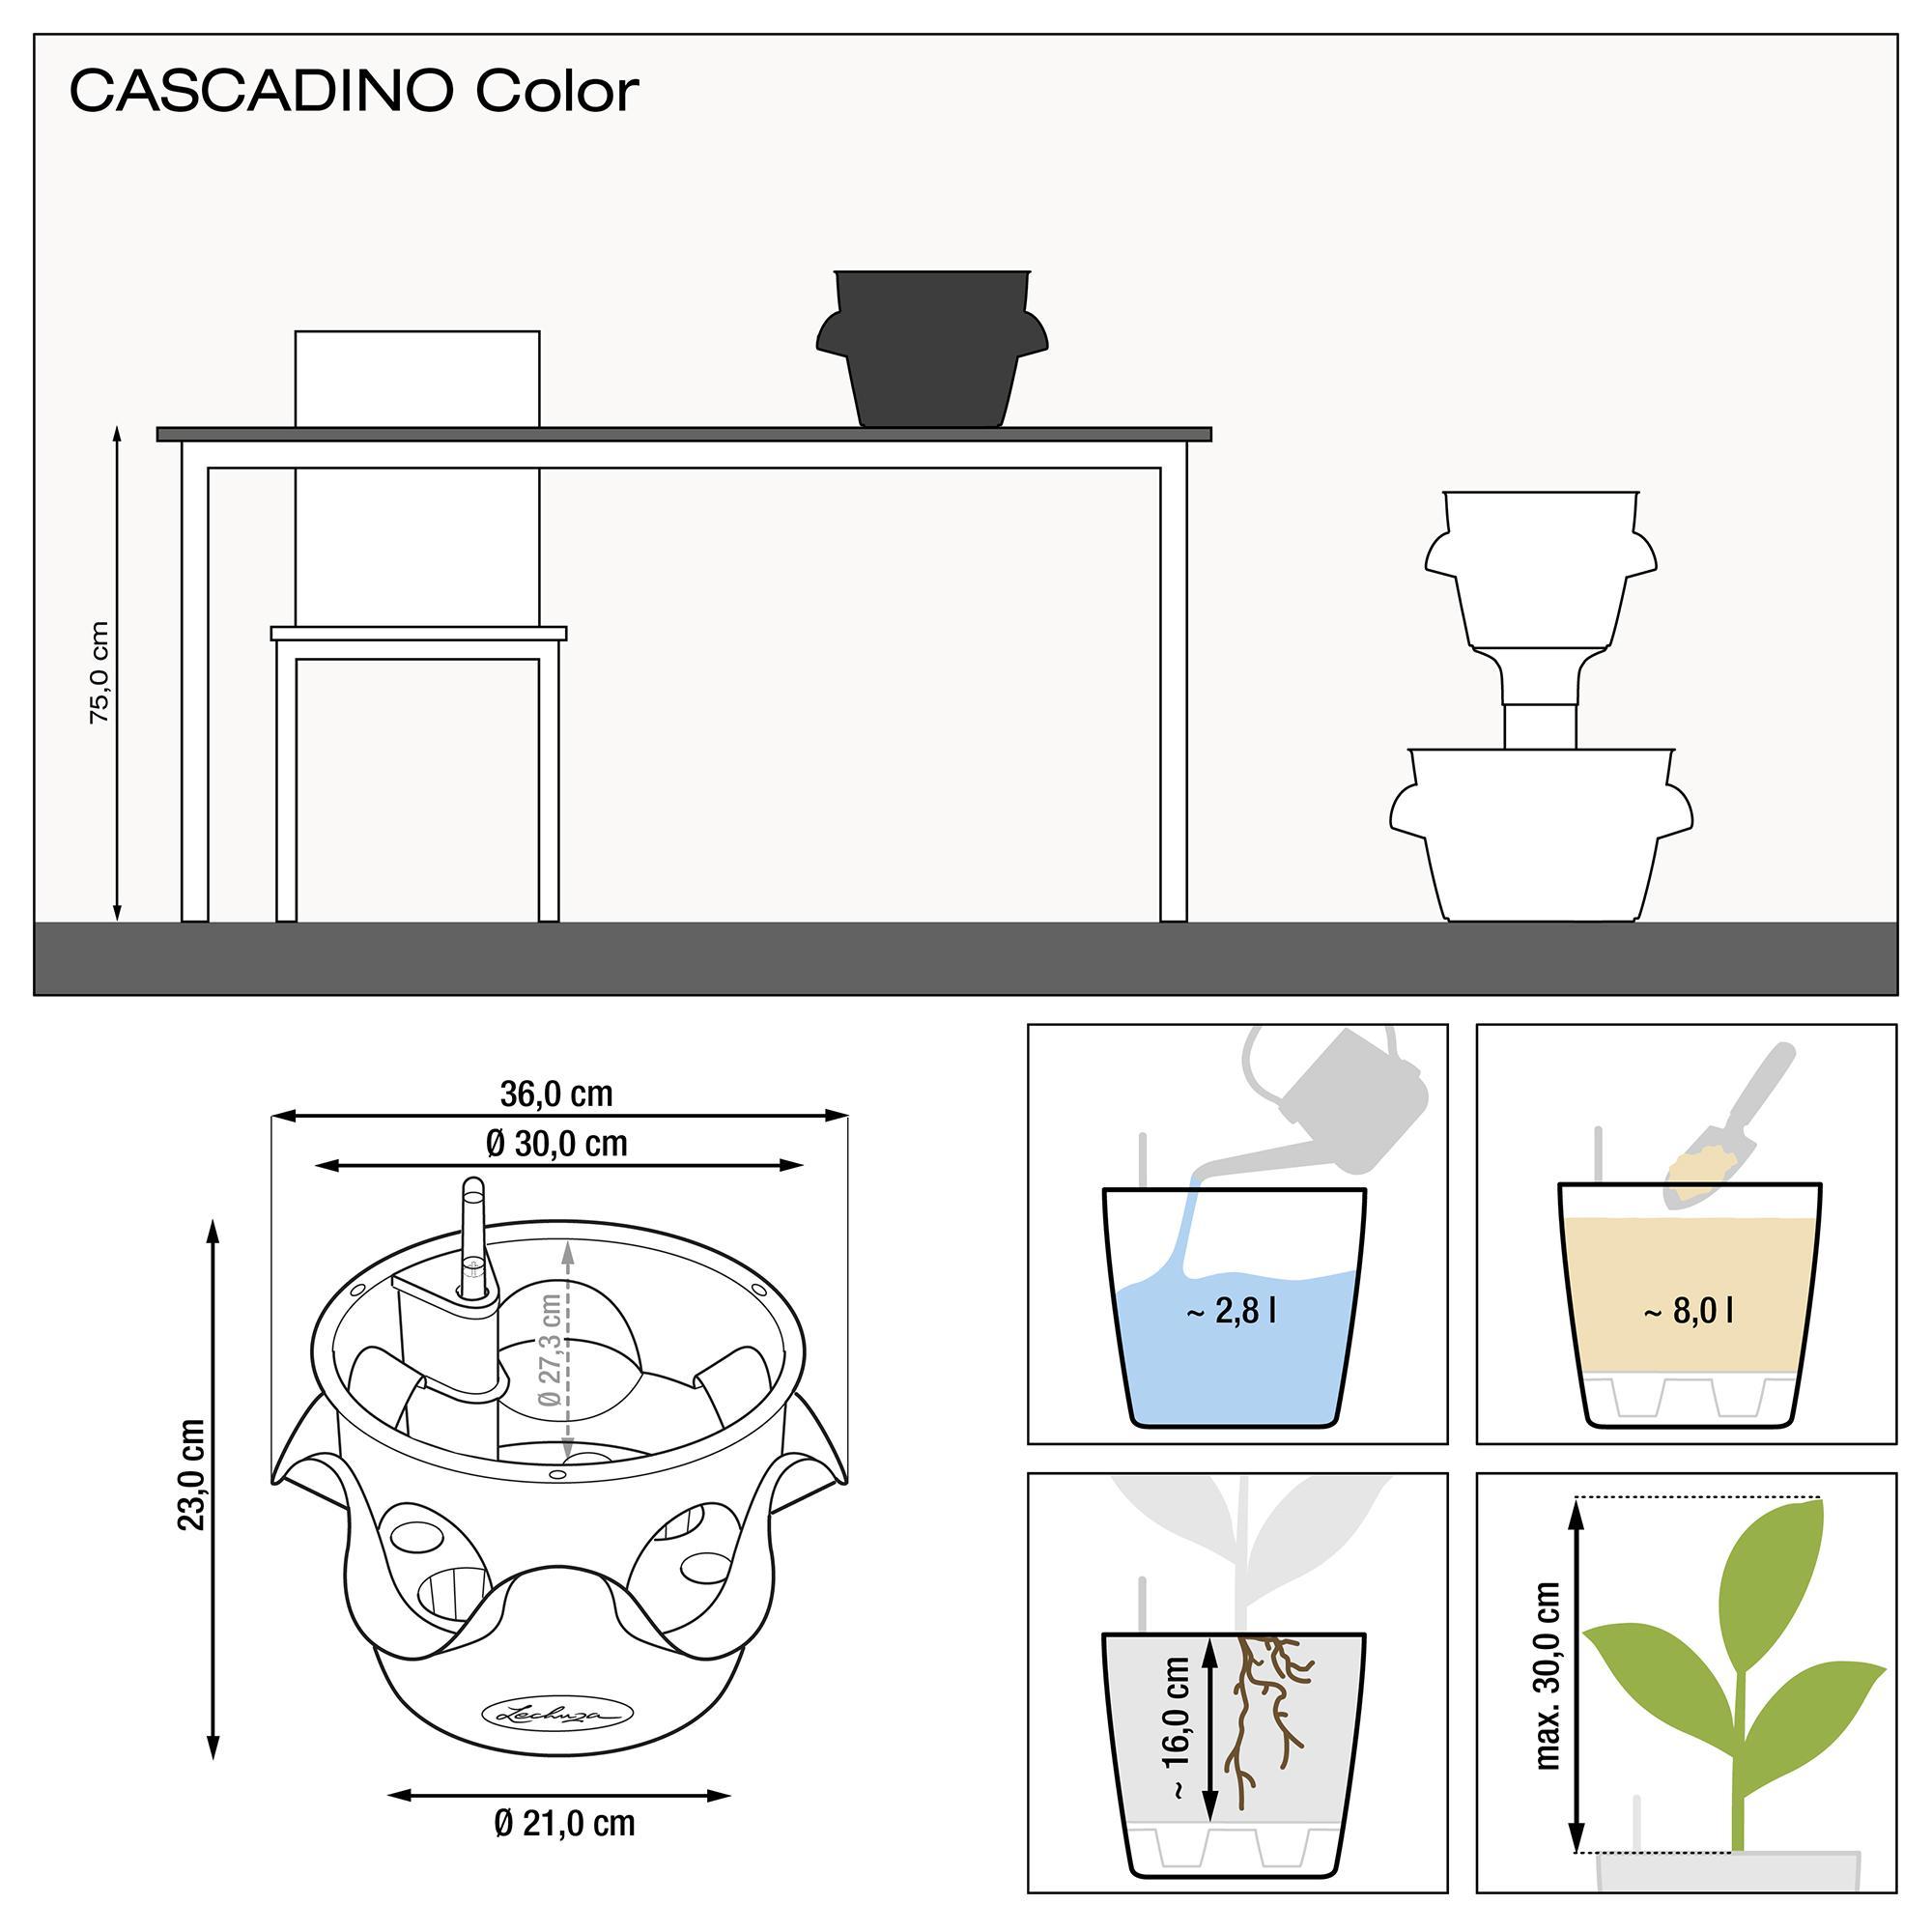 CASCADINO Color pistachio - Image 2